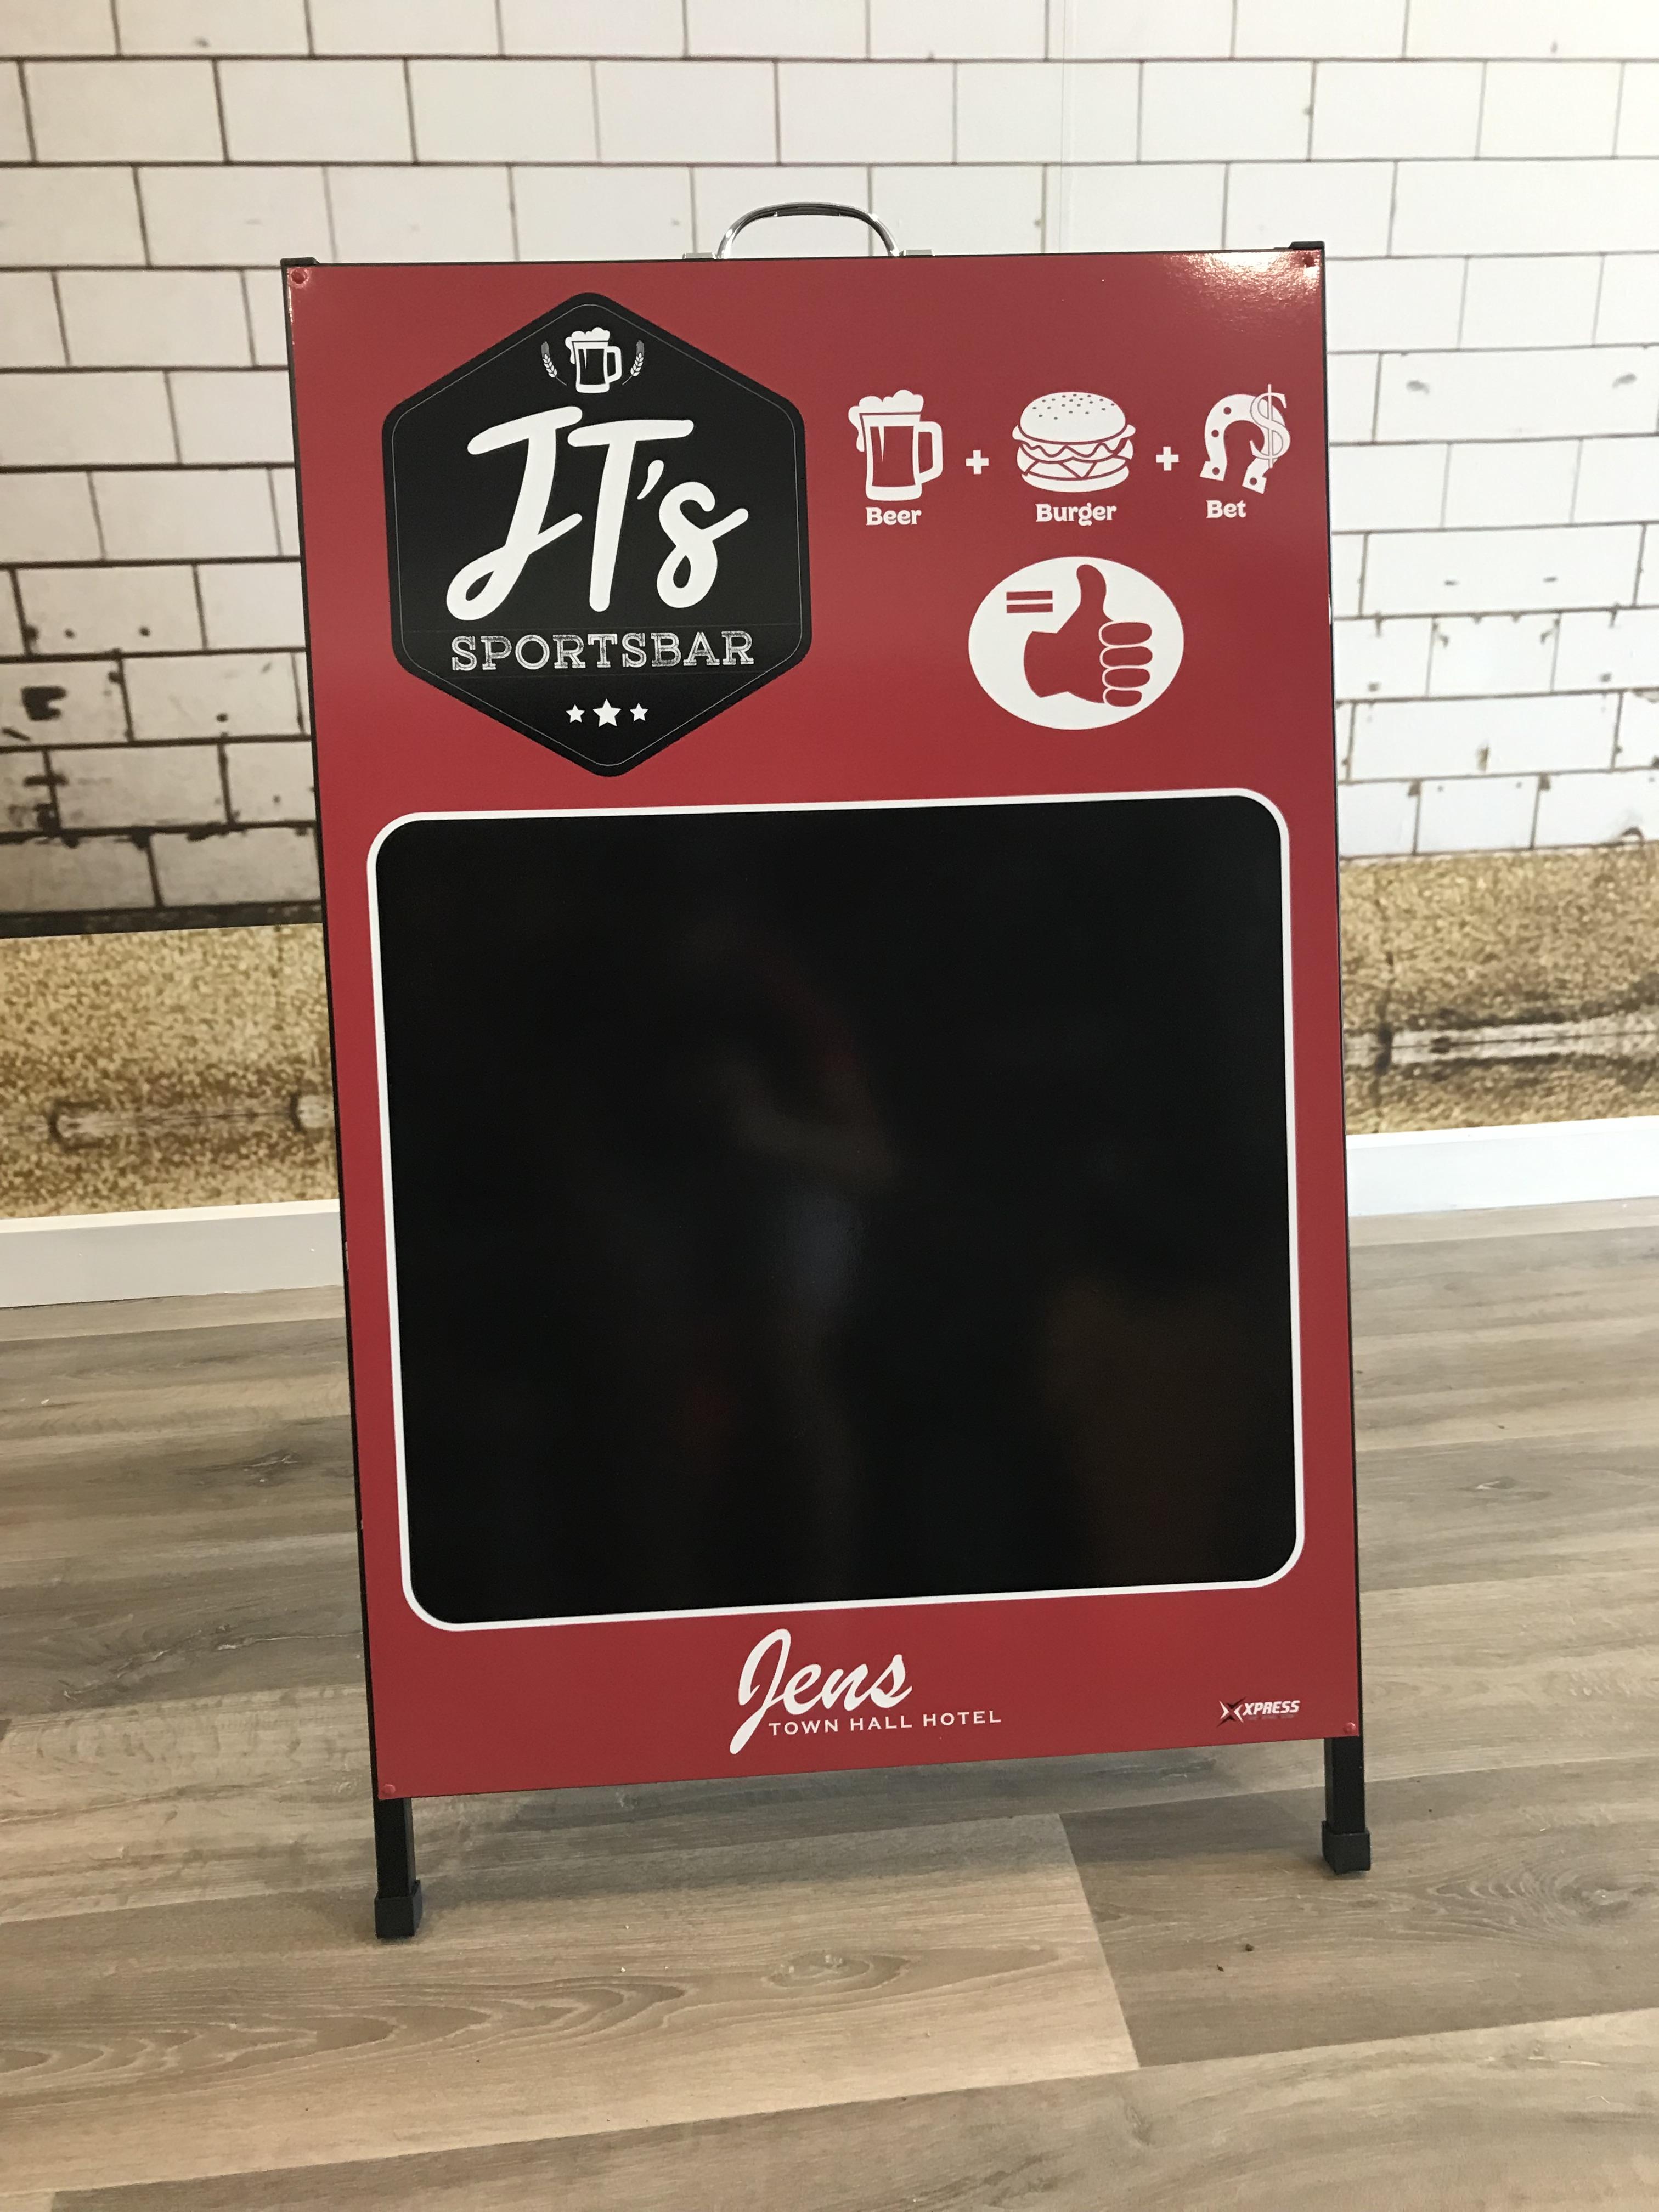 JT's Sportsbar A-Frame